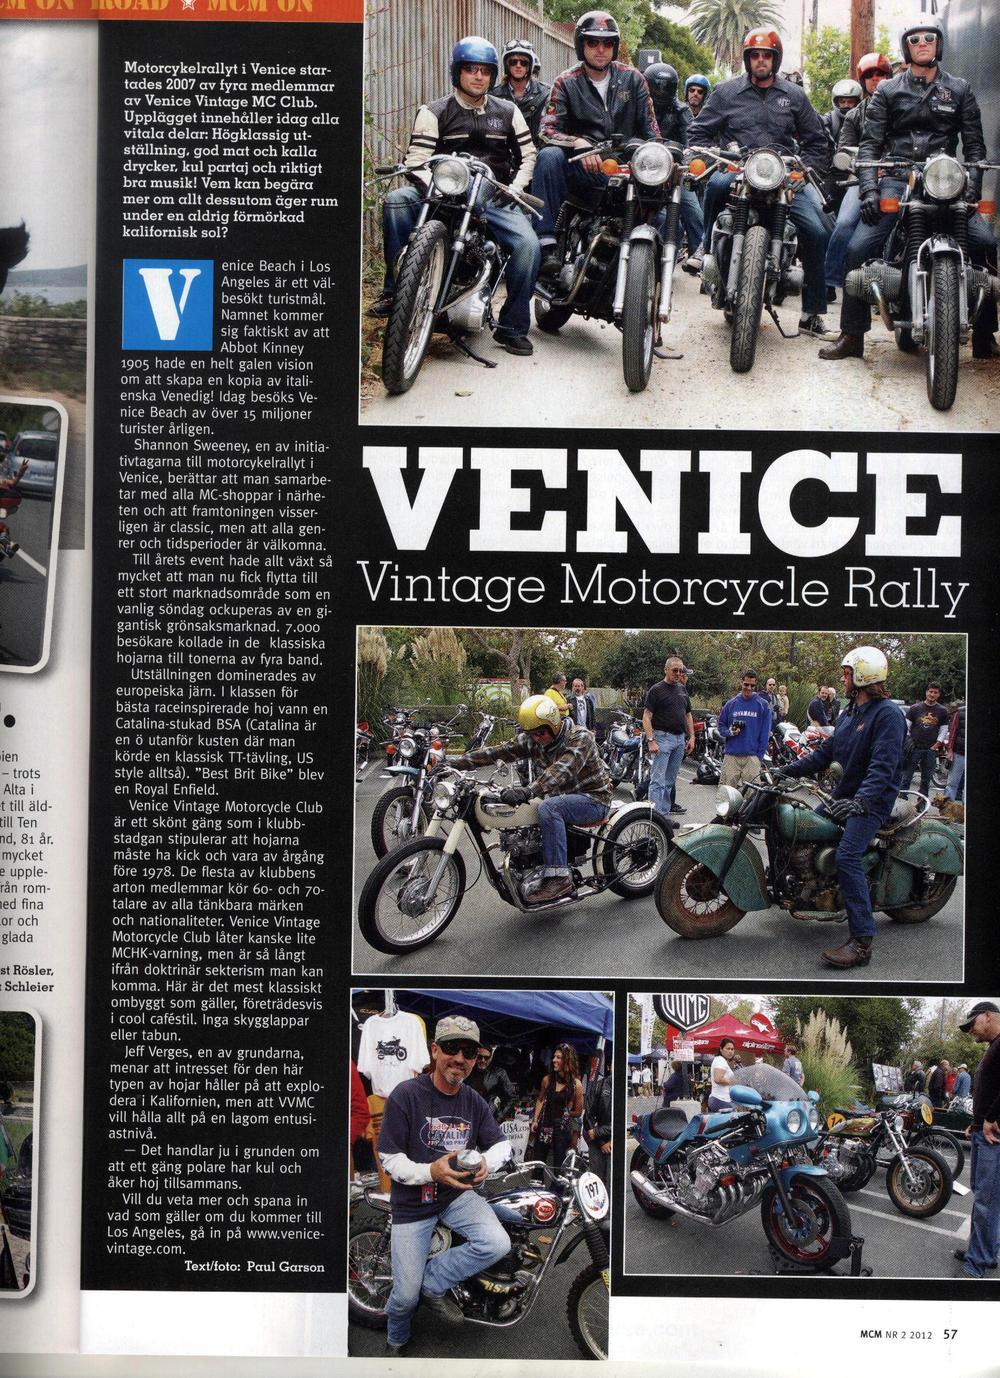 4-MCM-Venice-VMC-a1.jpg